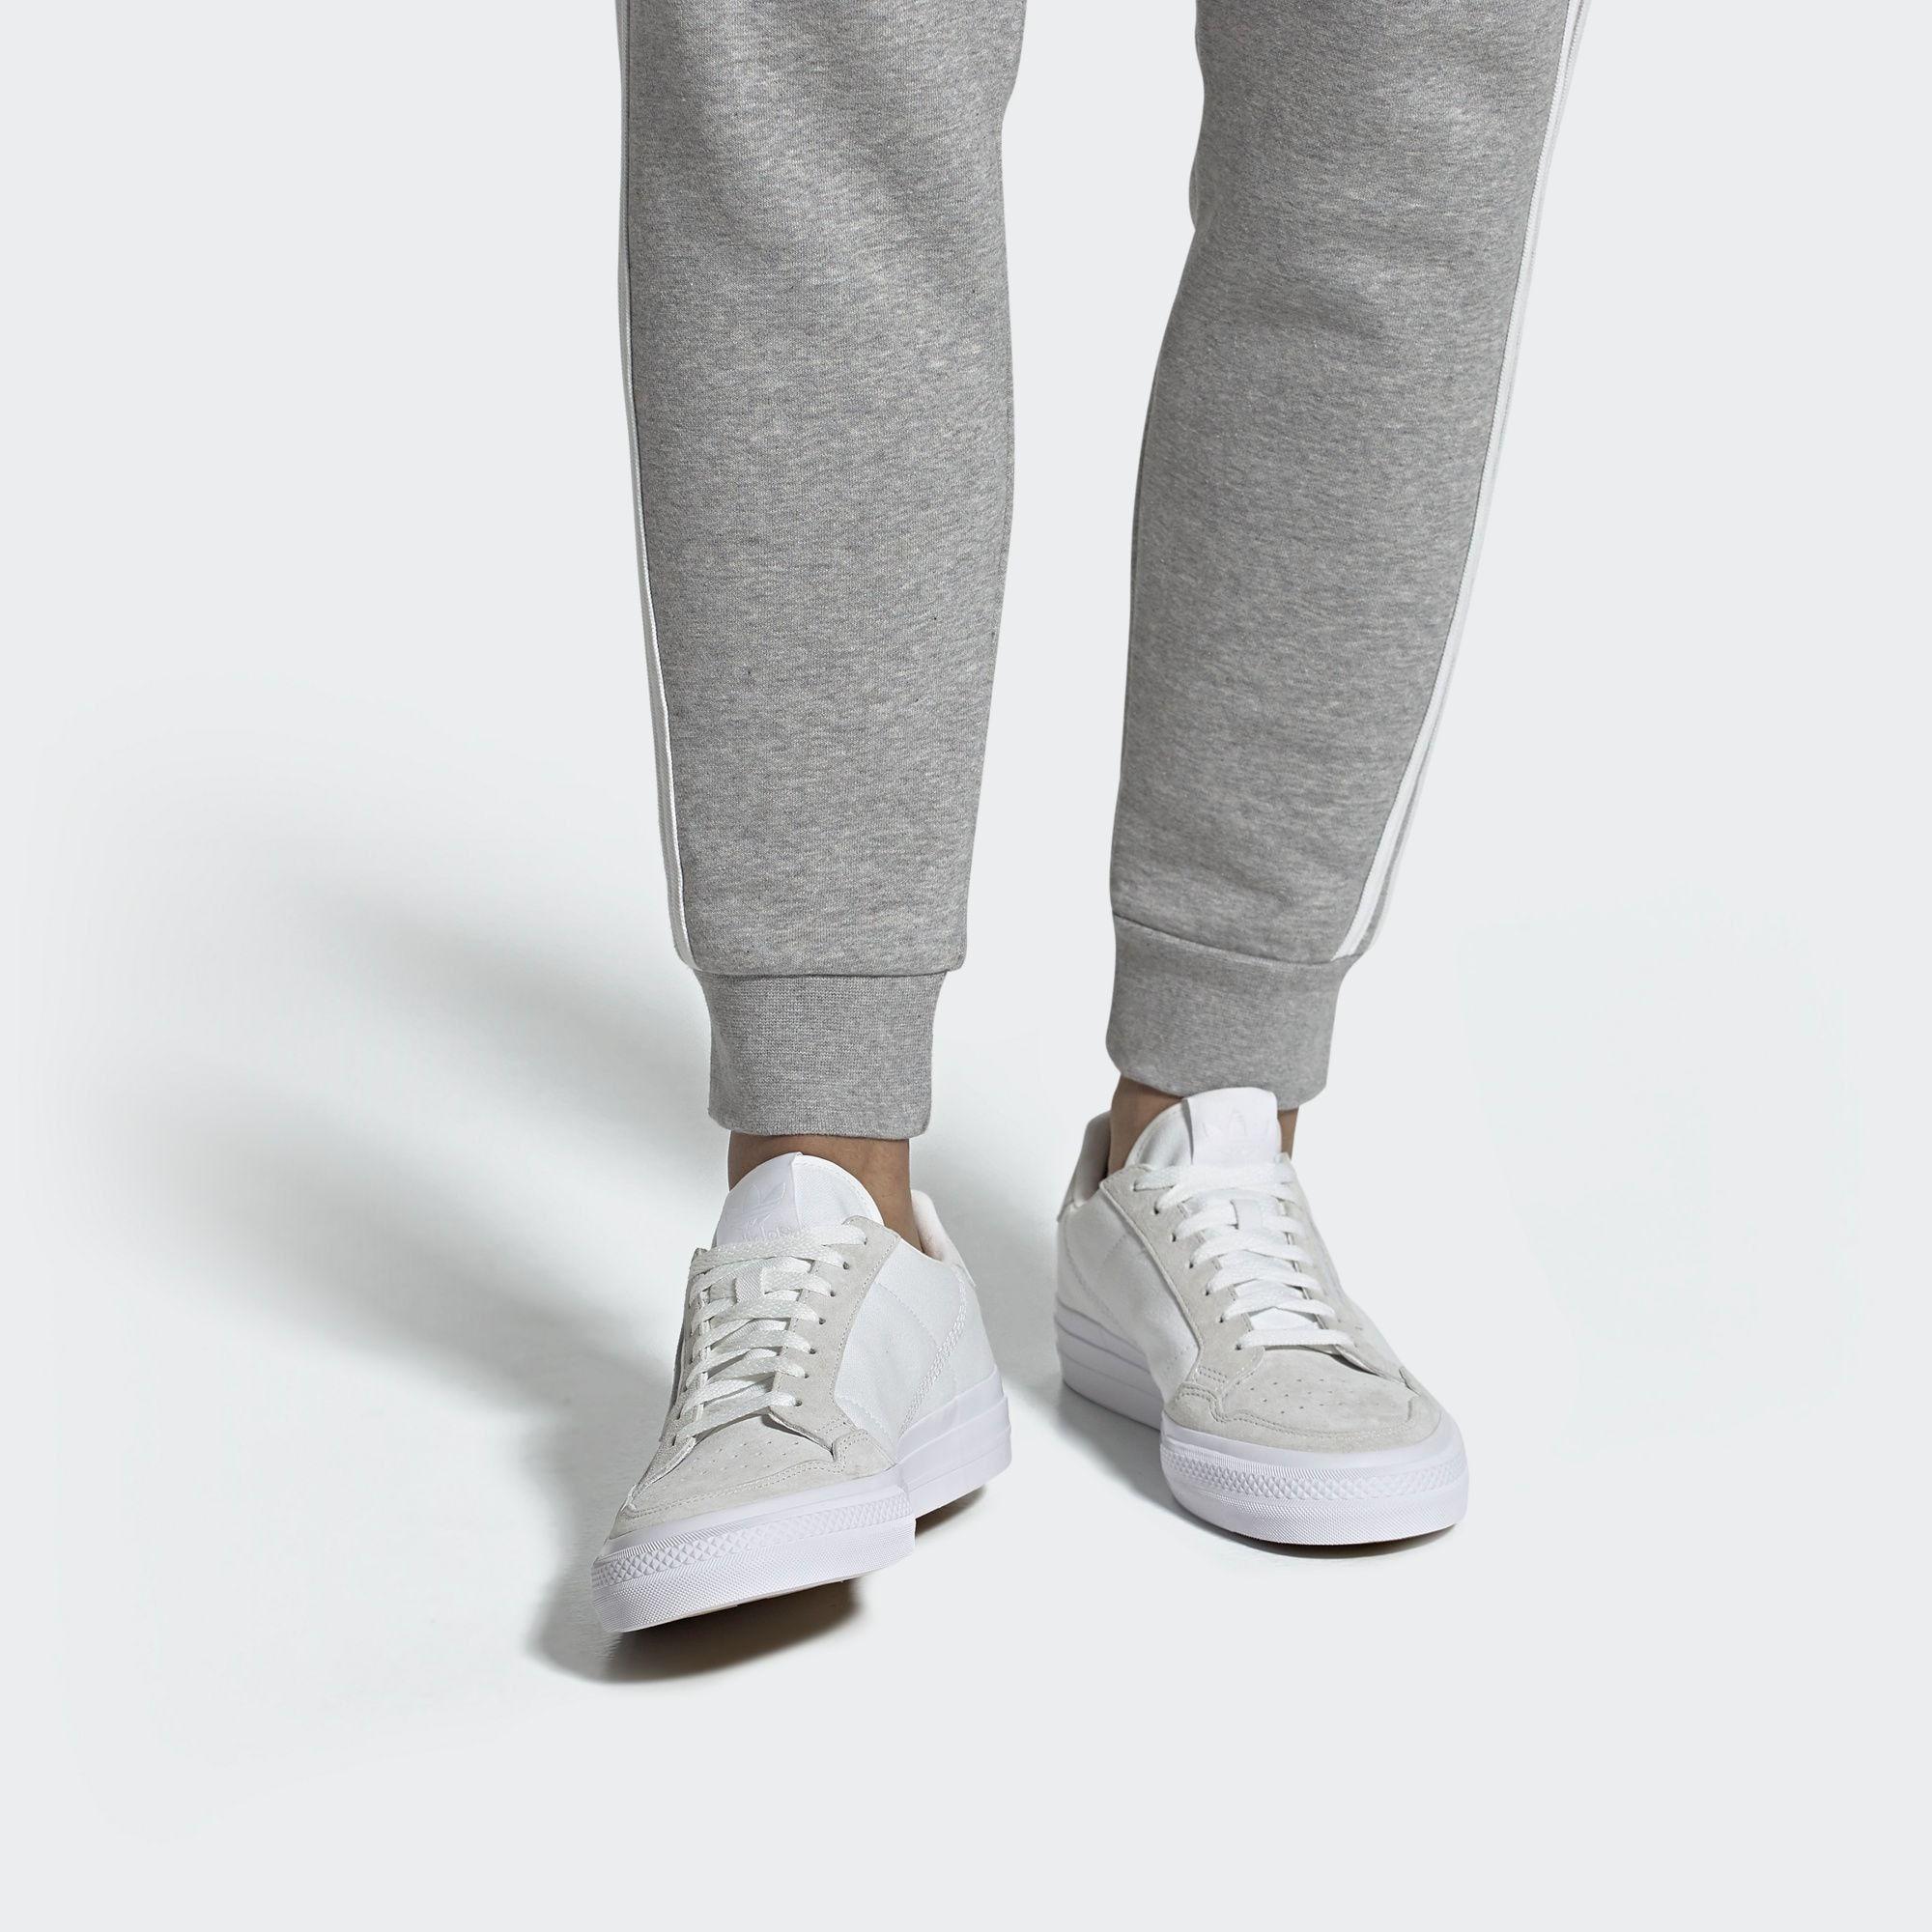 ADIDAS ORIGINALS Sneaker 'Continental Vulc' Damen, Creme ...